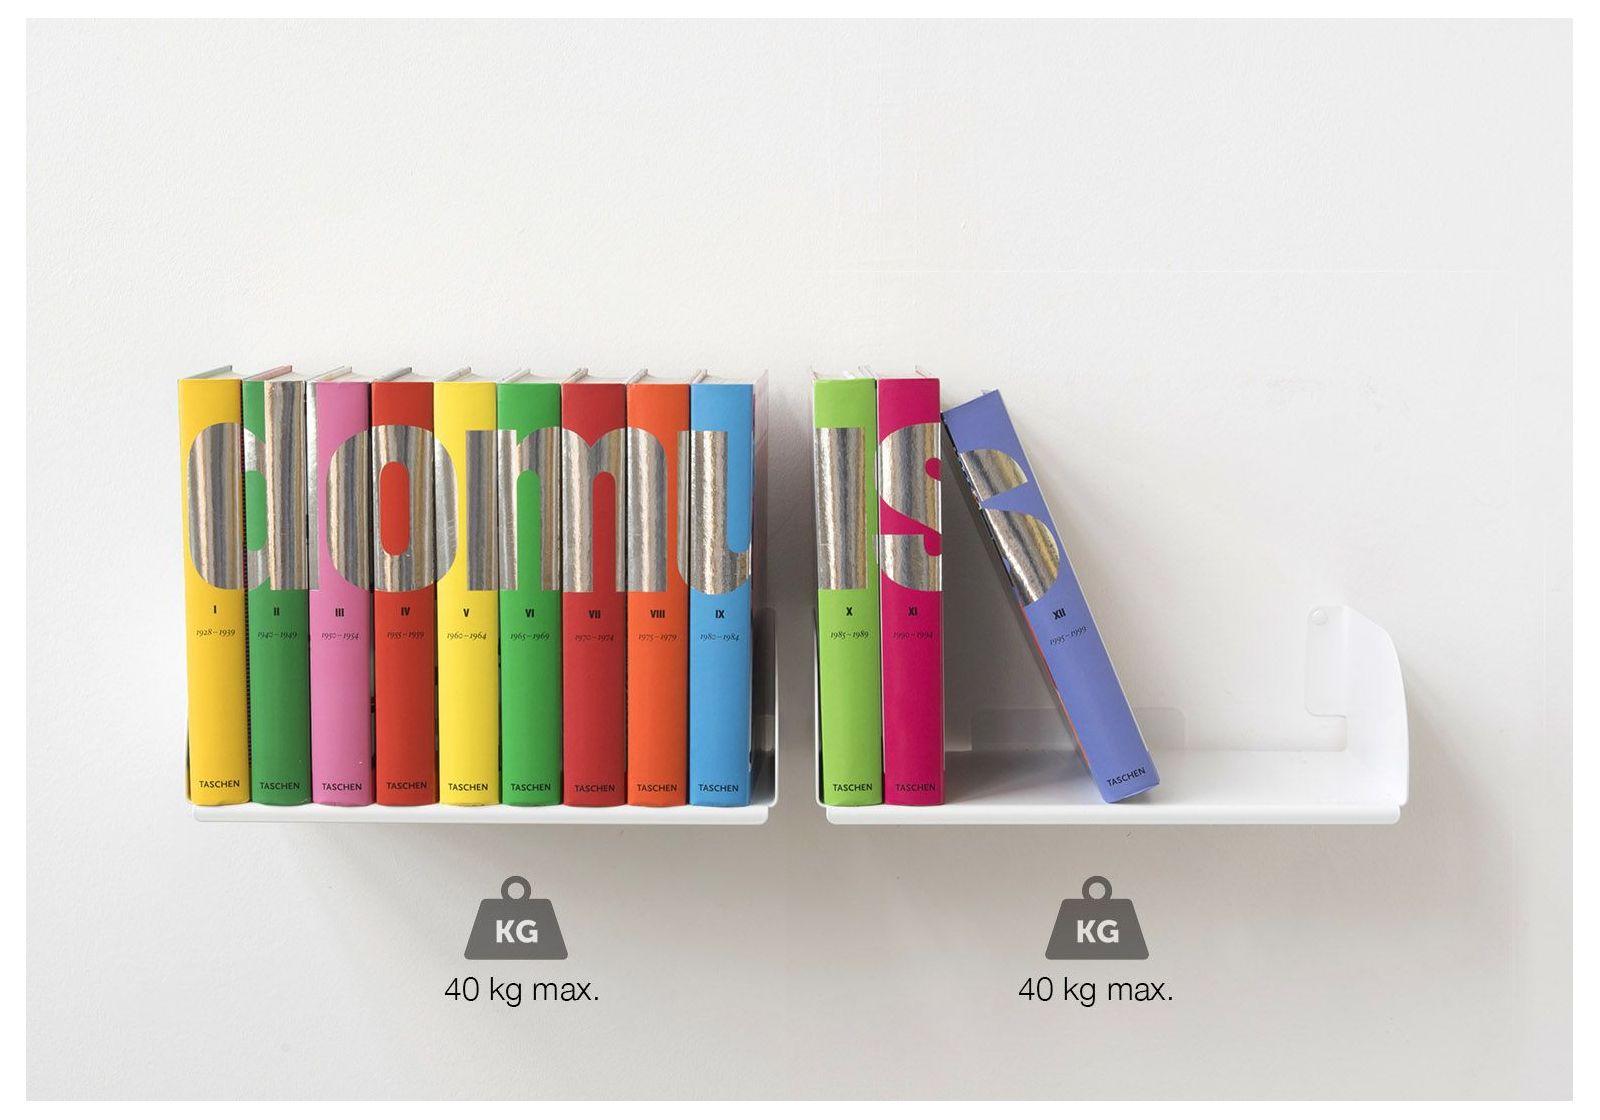 Wall bookshelves UBD 17,71 inch   Set of 4